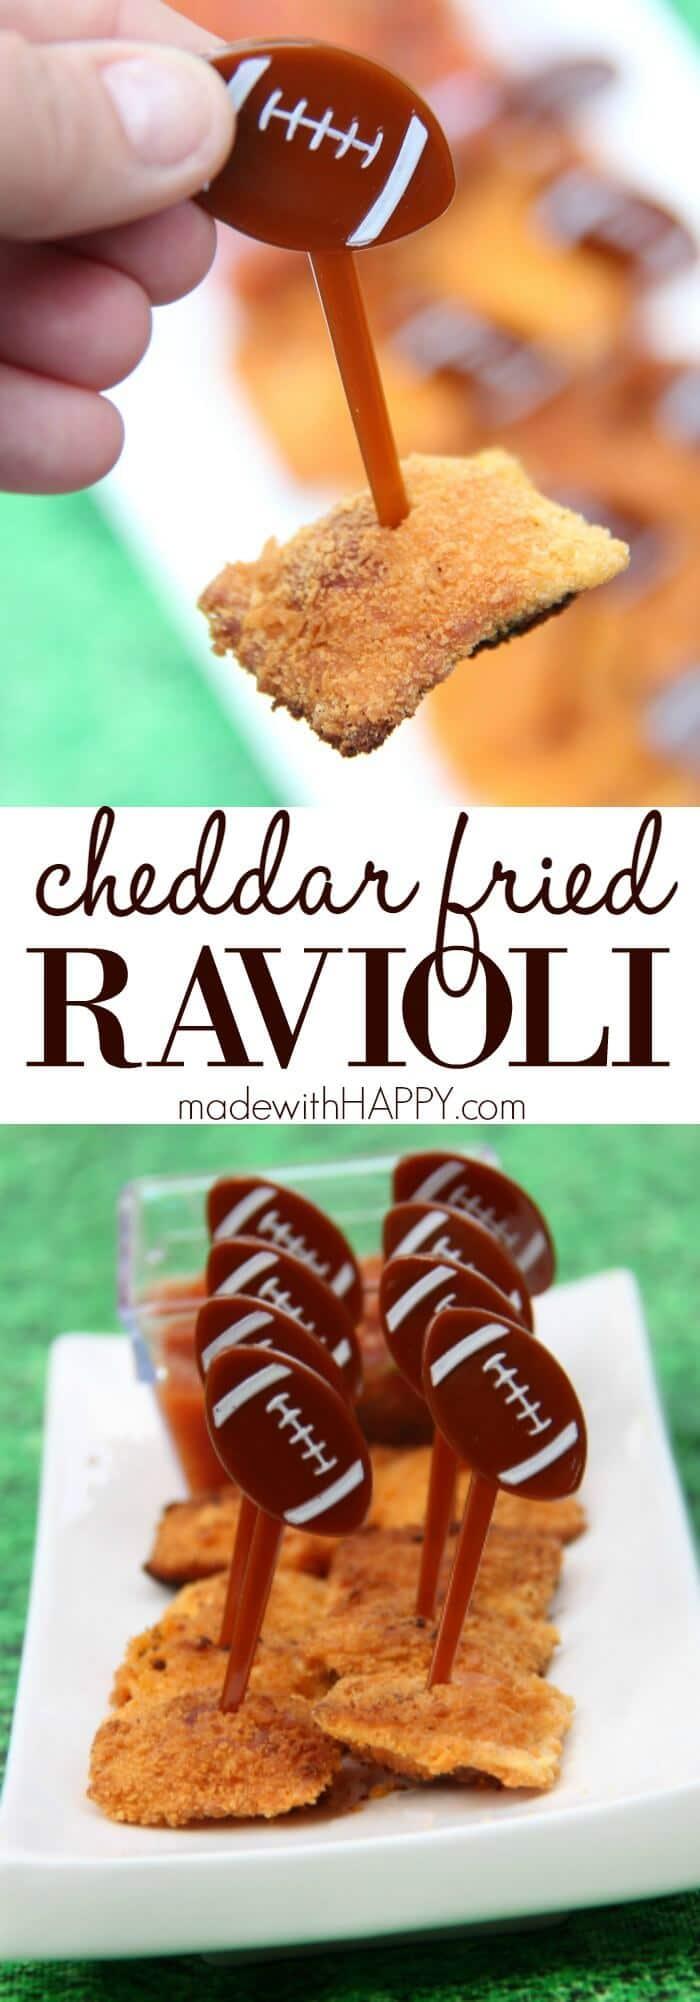 Cheddar Fried Ravioli   Game Day Appetizer   Kid friendly appetizers   www.madewithHAPPY.com